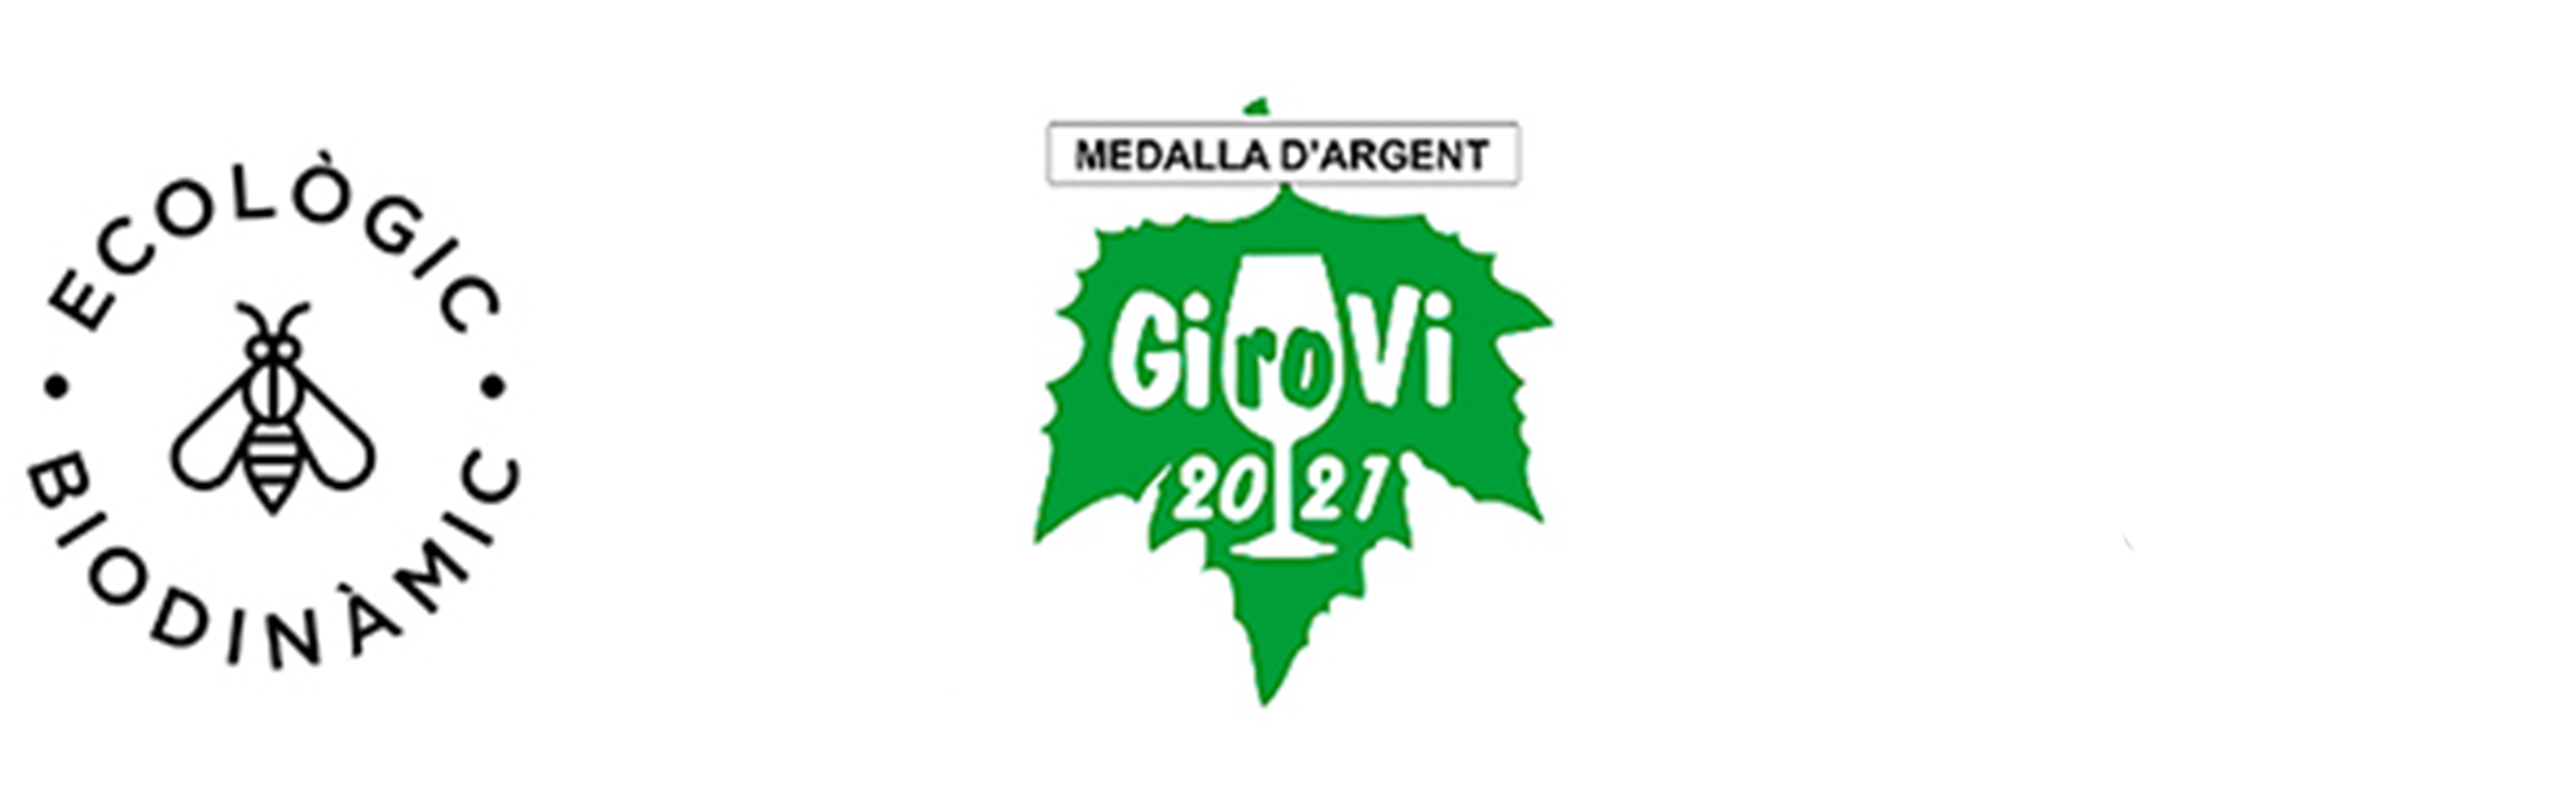 Girovi_2.jpg